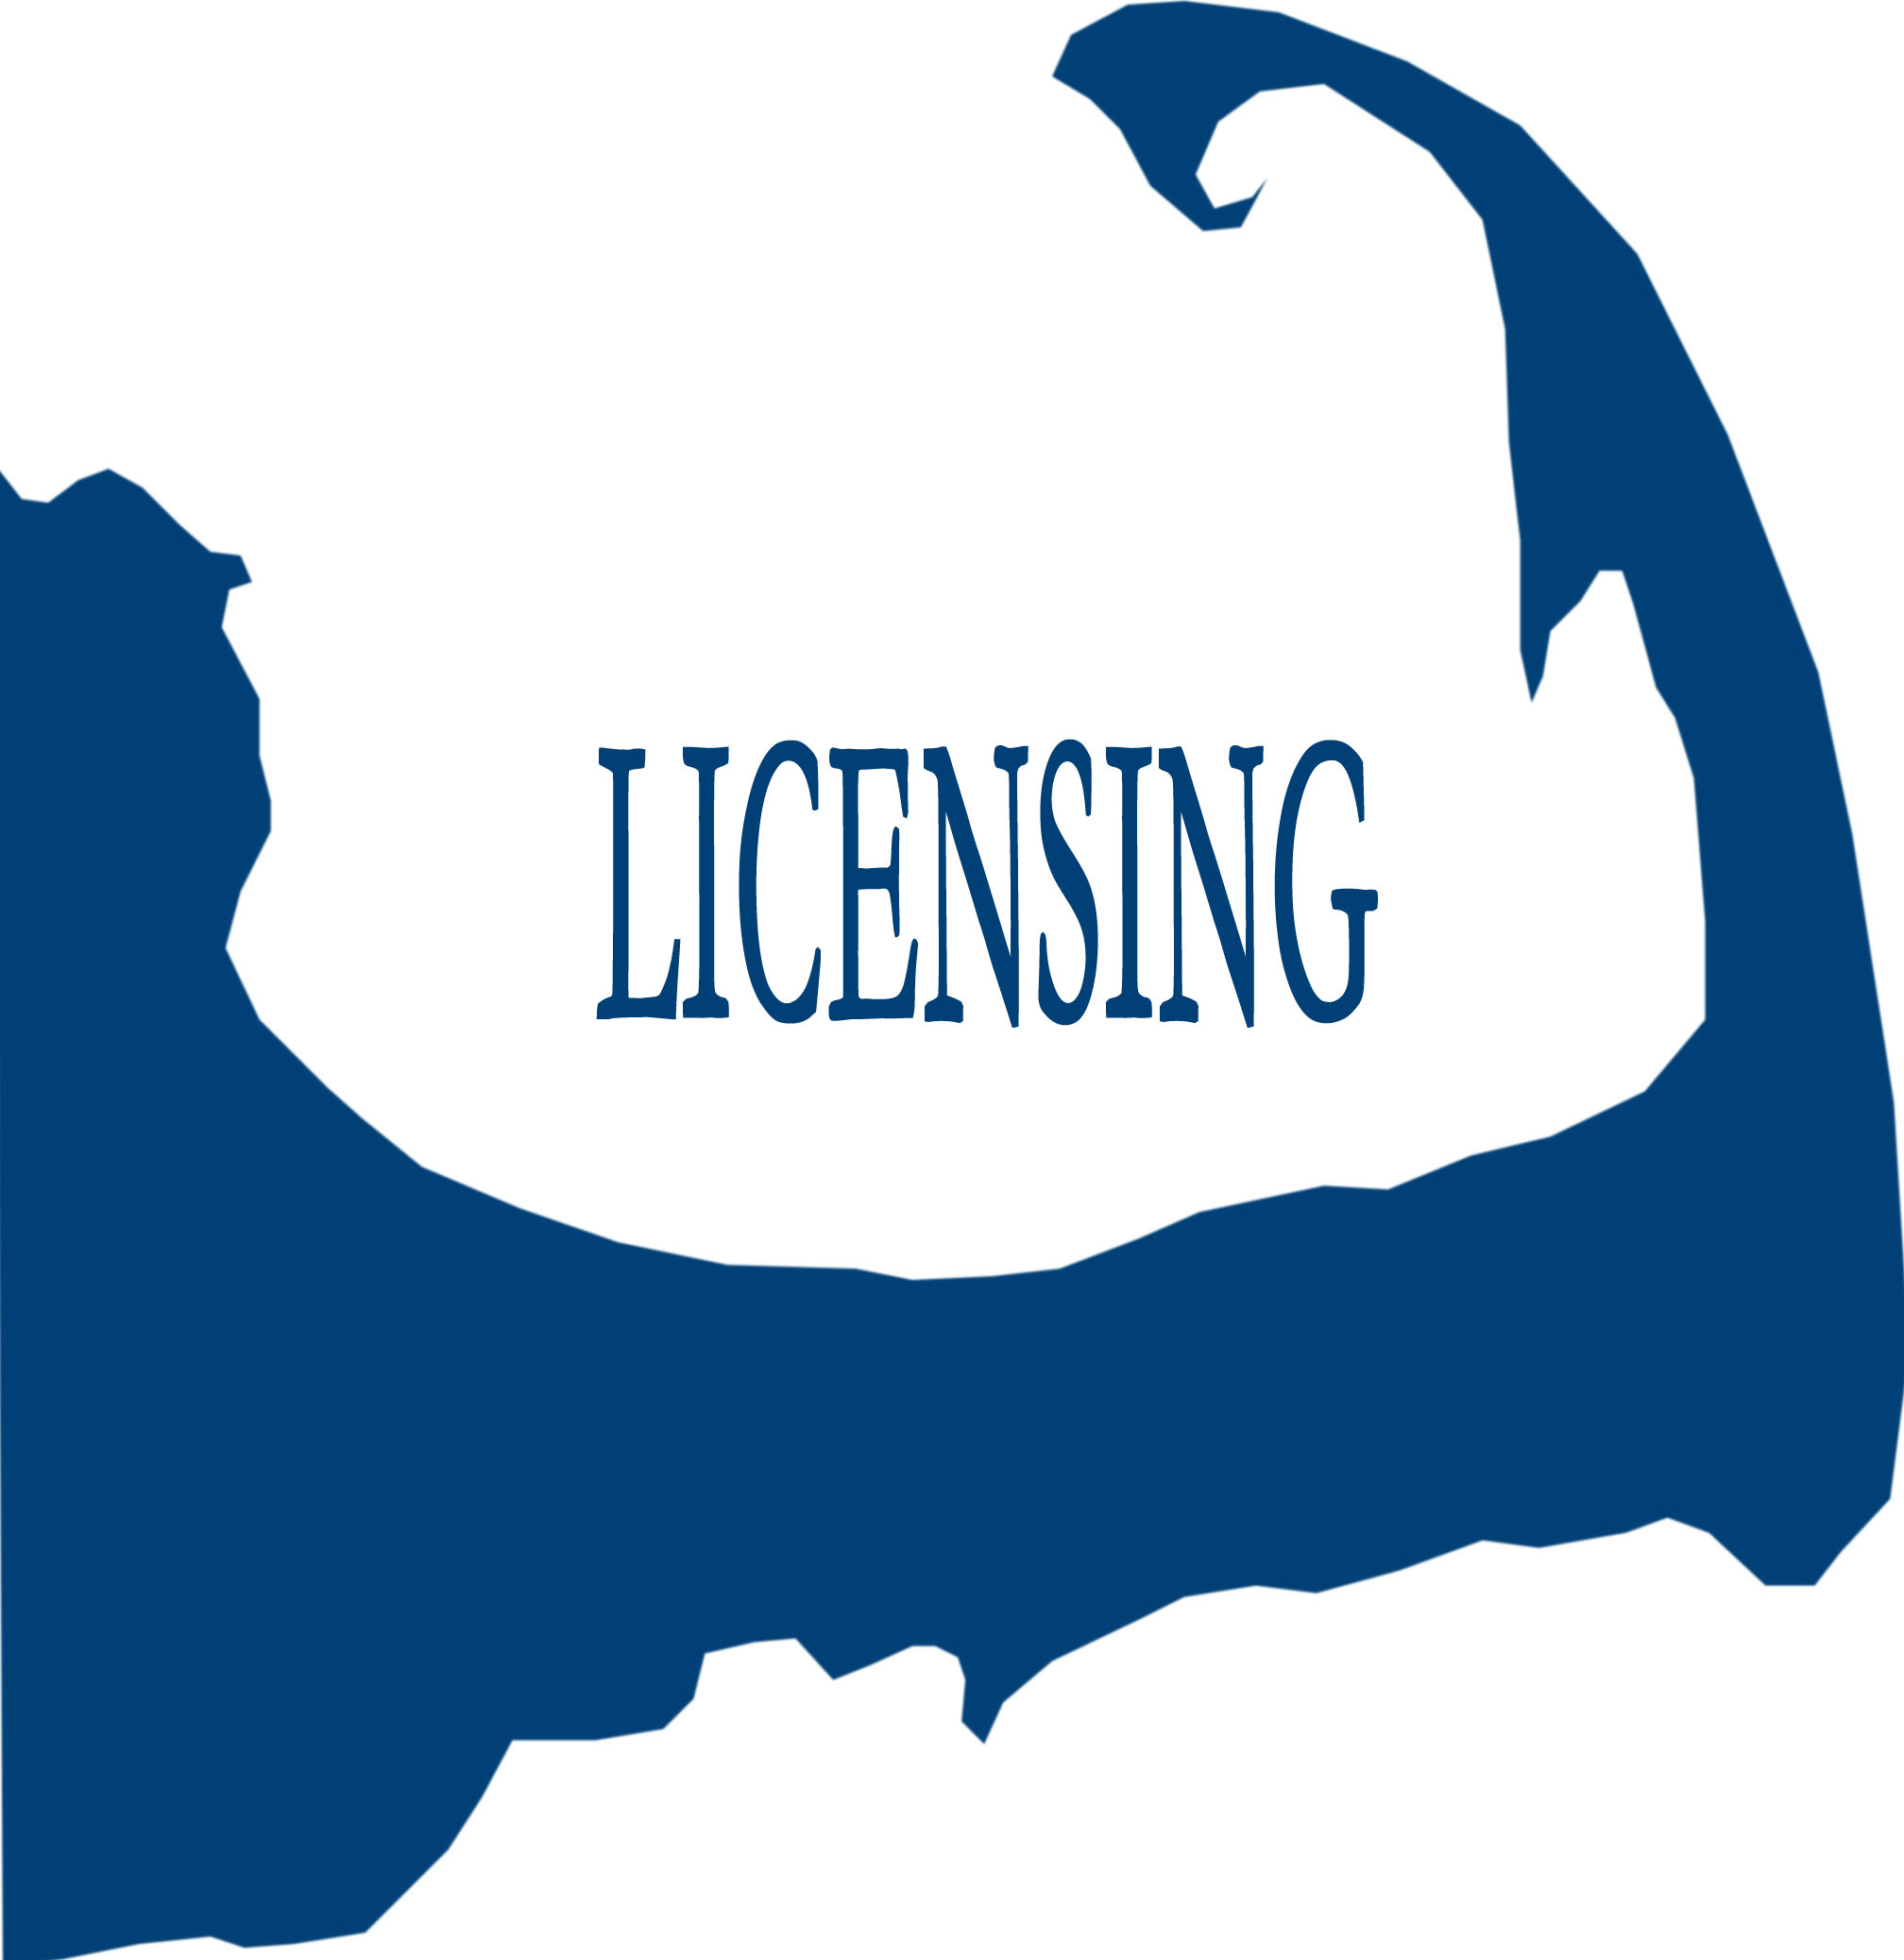 Get your Real Estate License